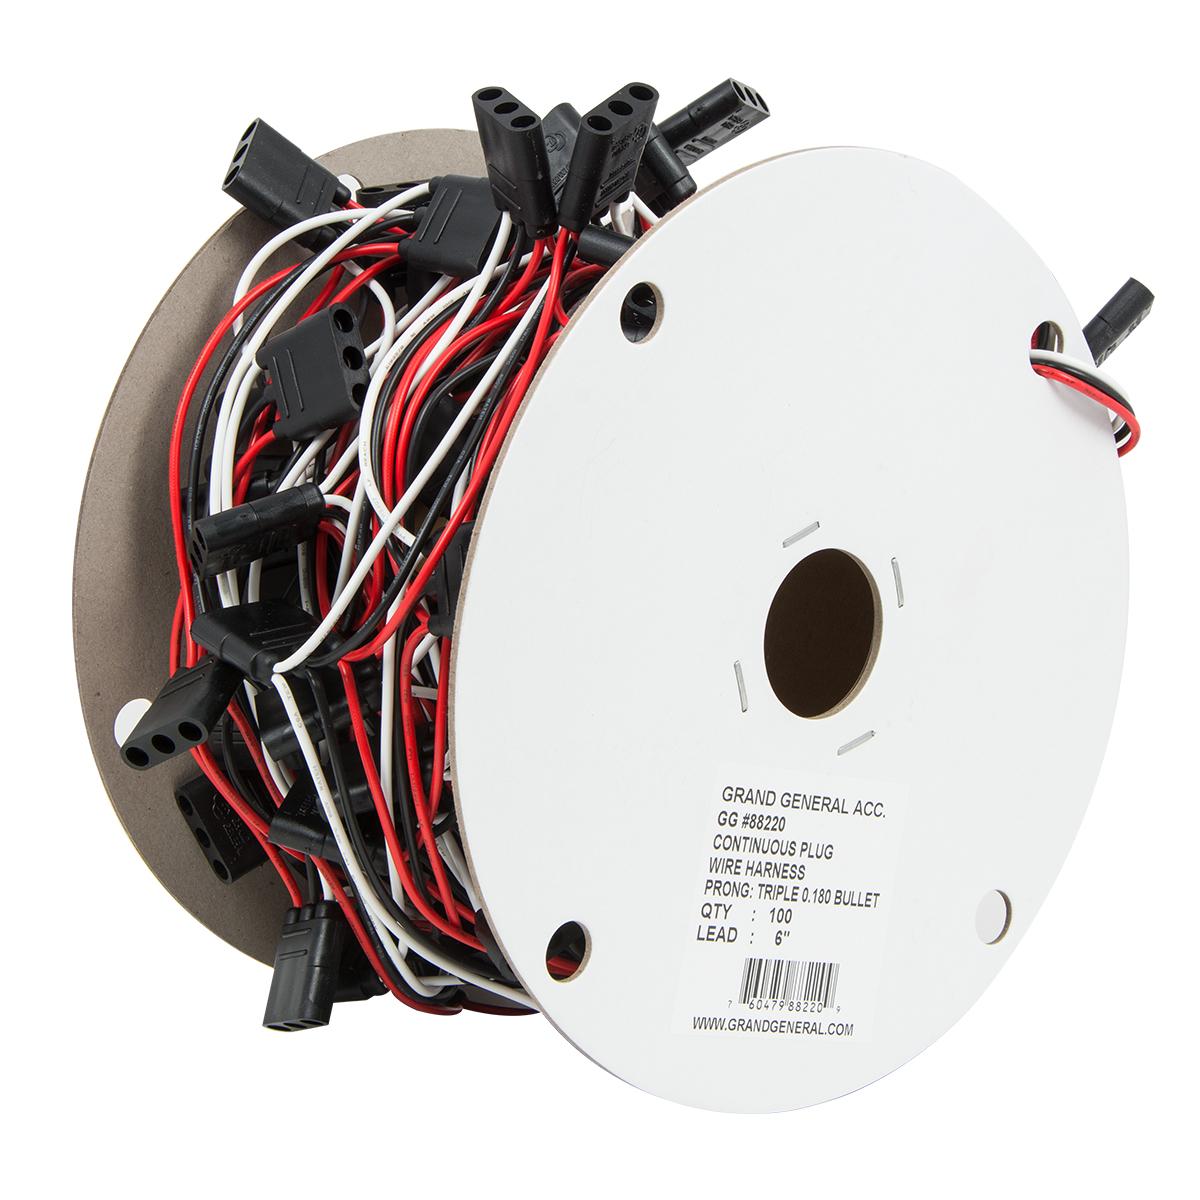 88220.MAIN_?fit=1200%2C1200&ssl=1 continuous triple female plug wire harness roll grand general